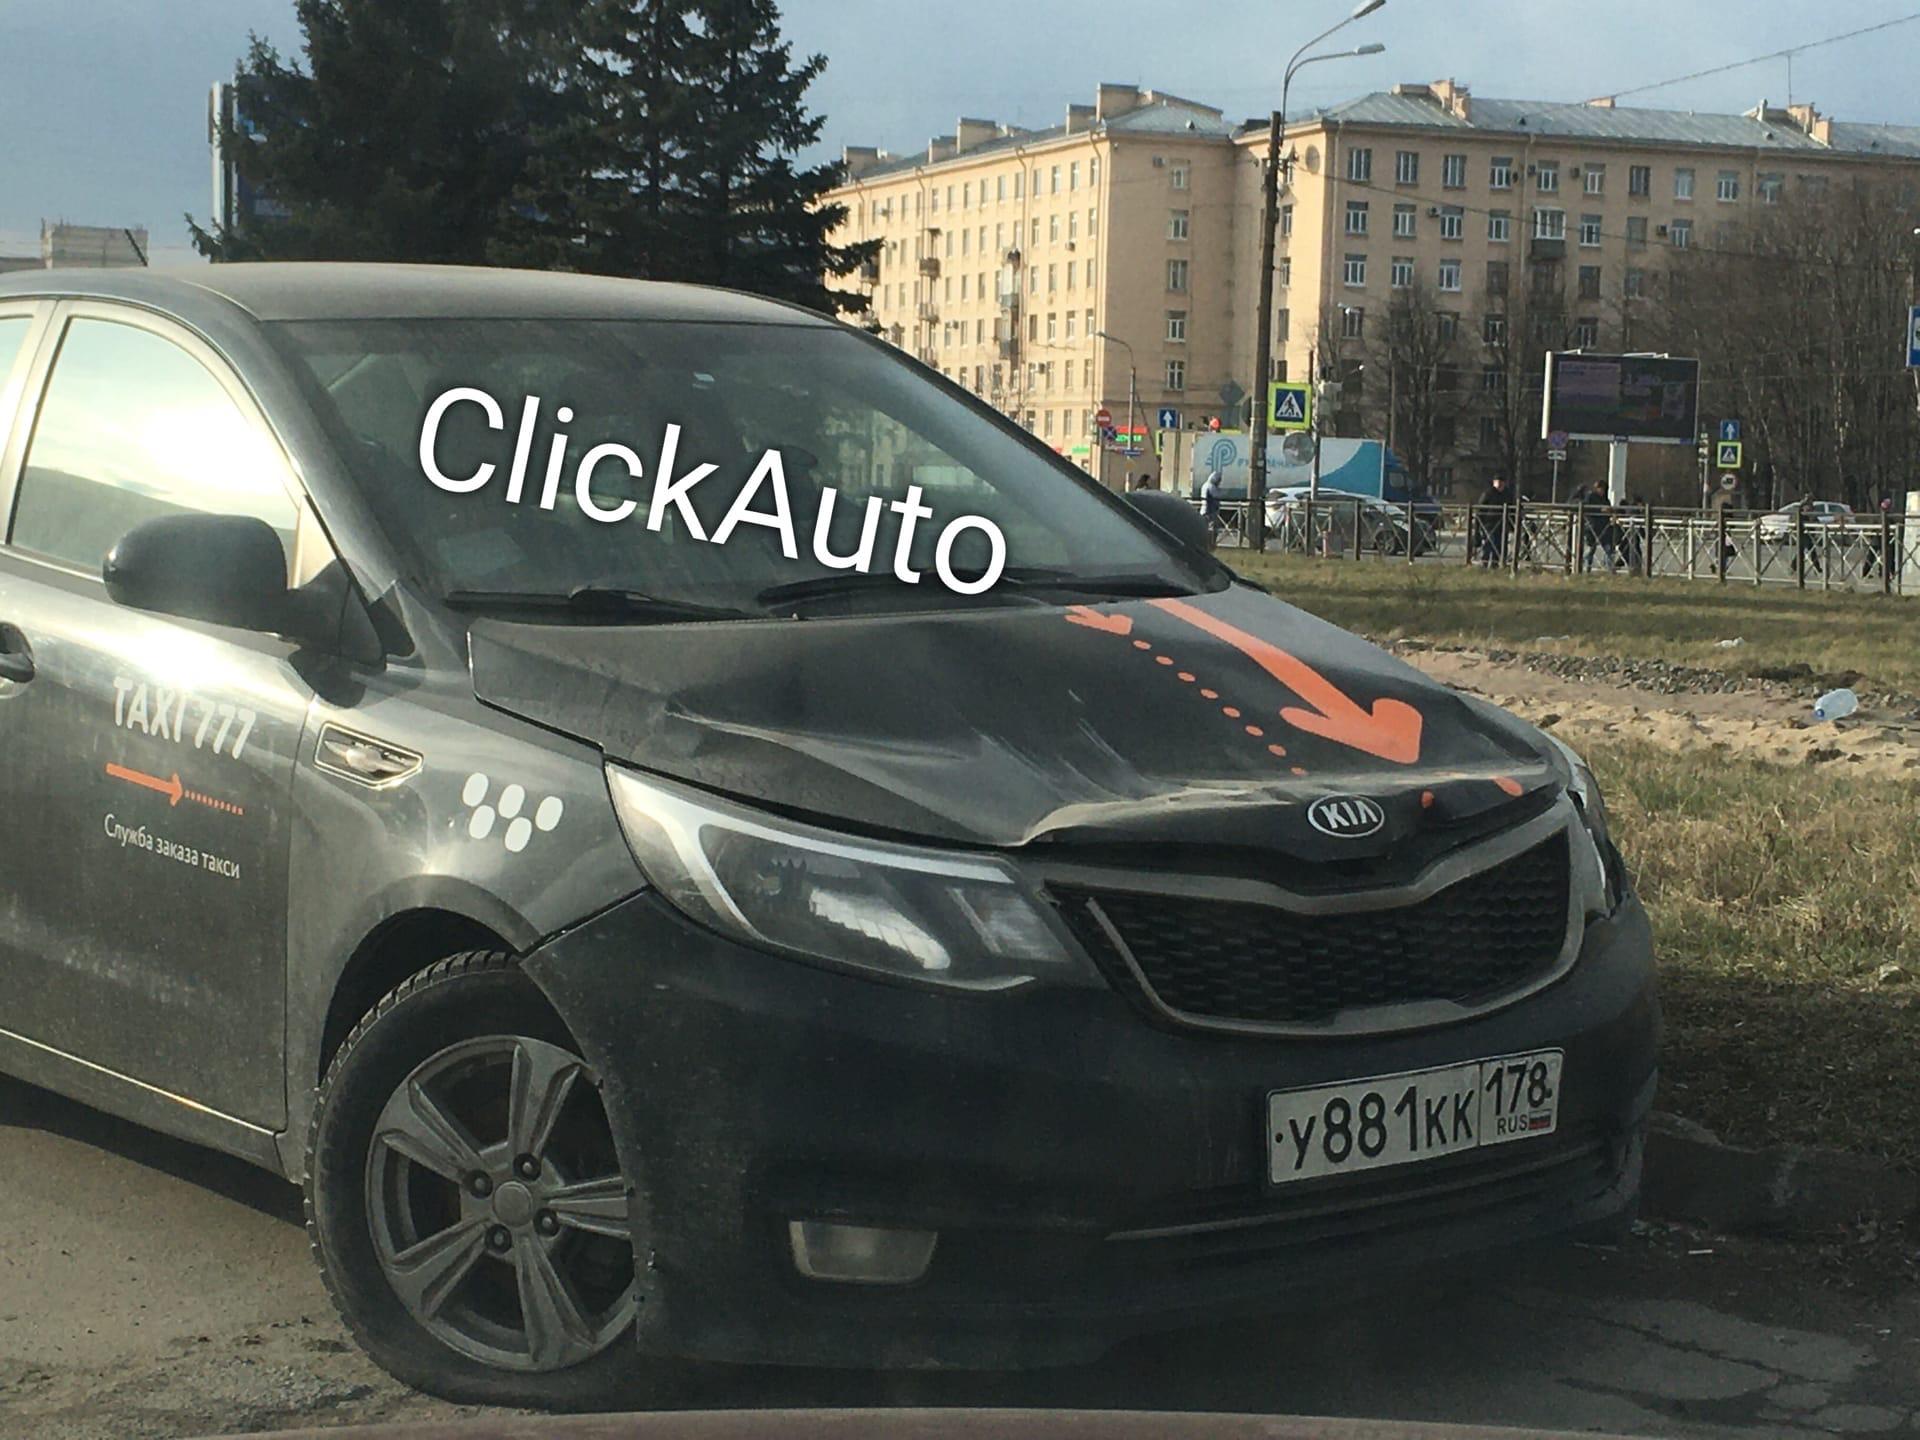 ClickAuto битая кия рио